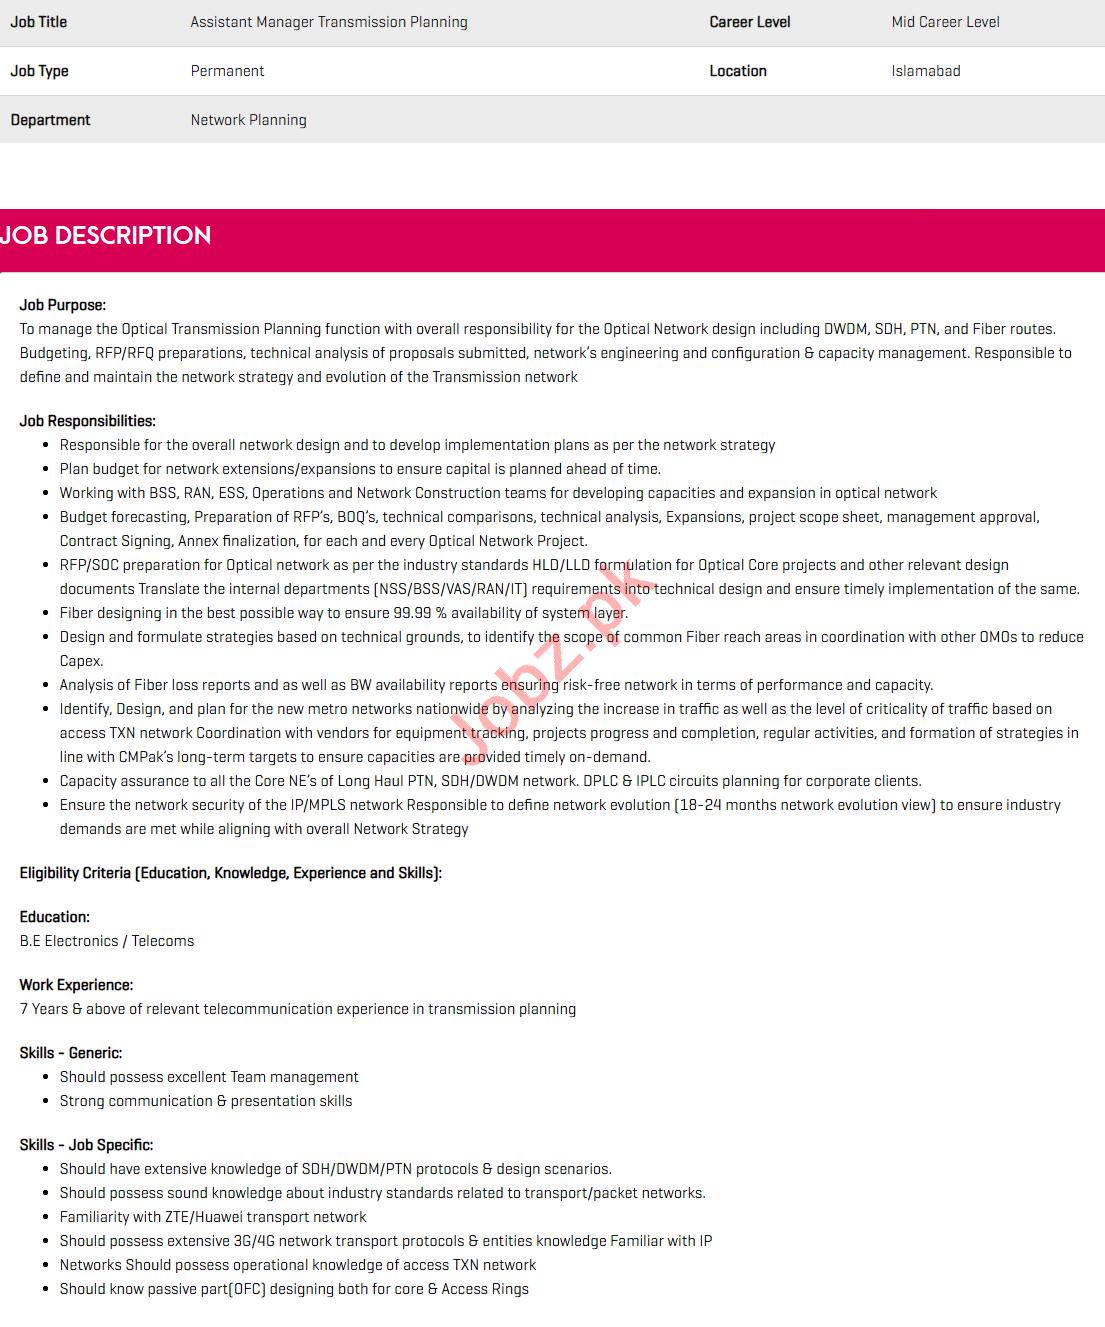 Assistant Manager Transmission Planning Jobs 2020